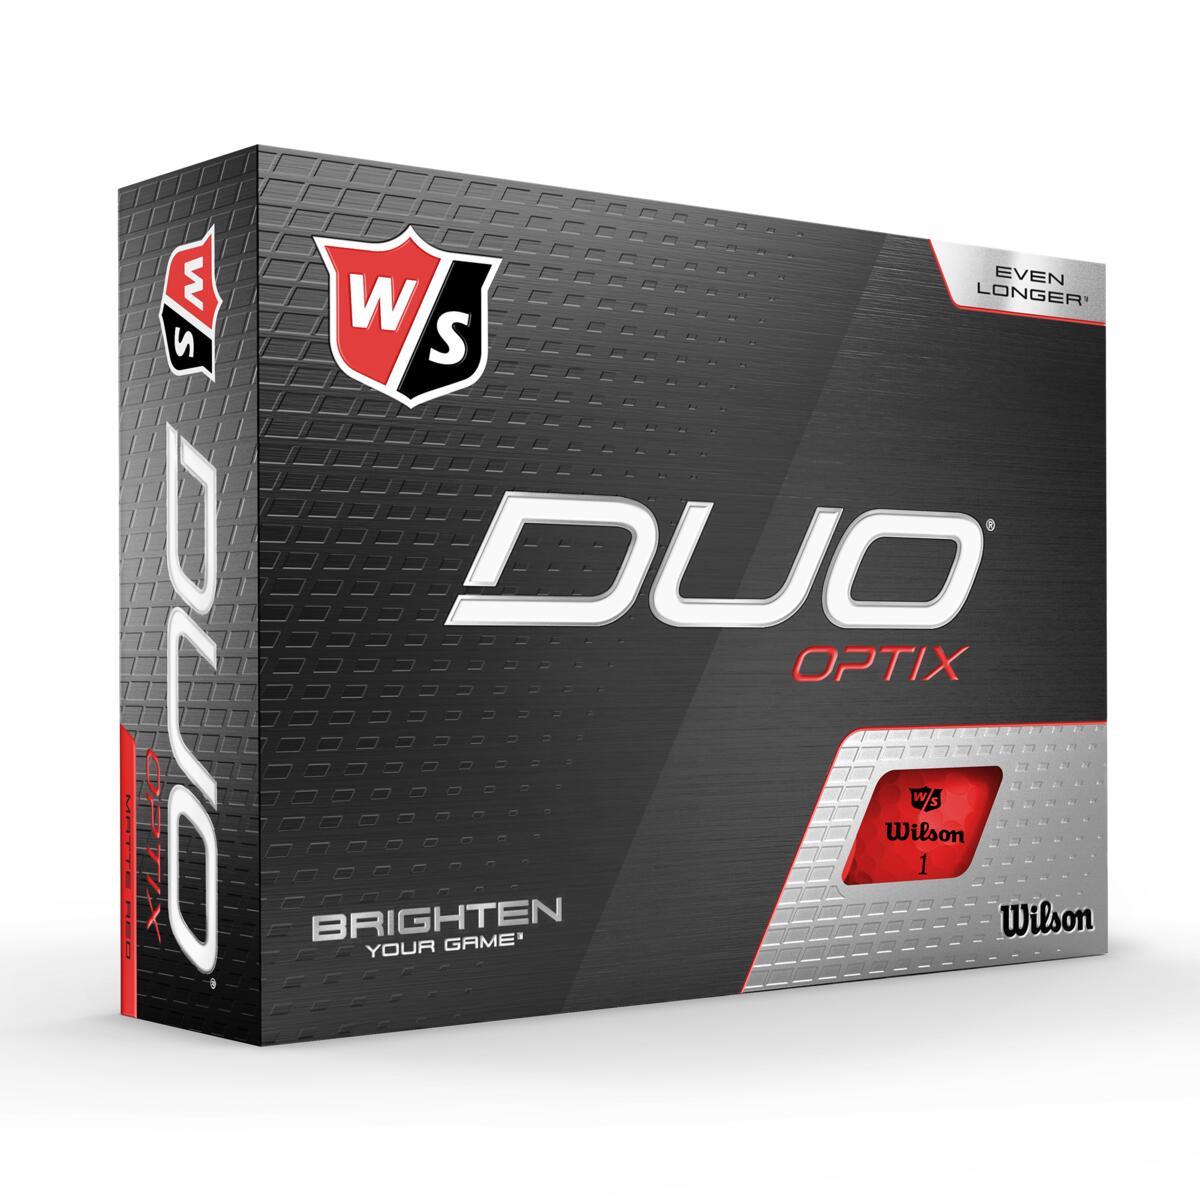 Wilson - Duo OPTIC Røde 12pack Golfbolde